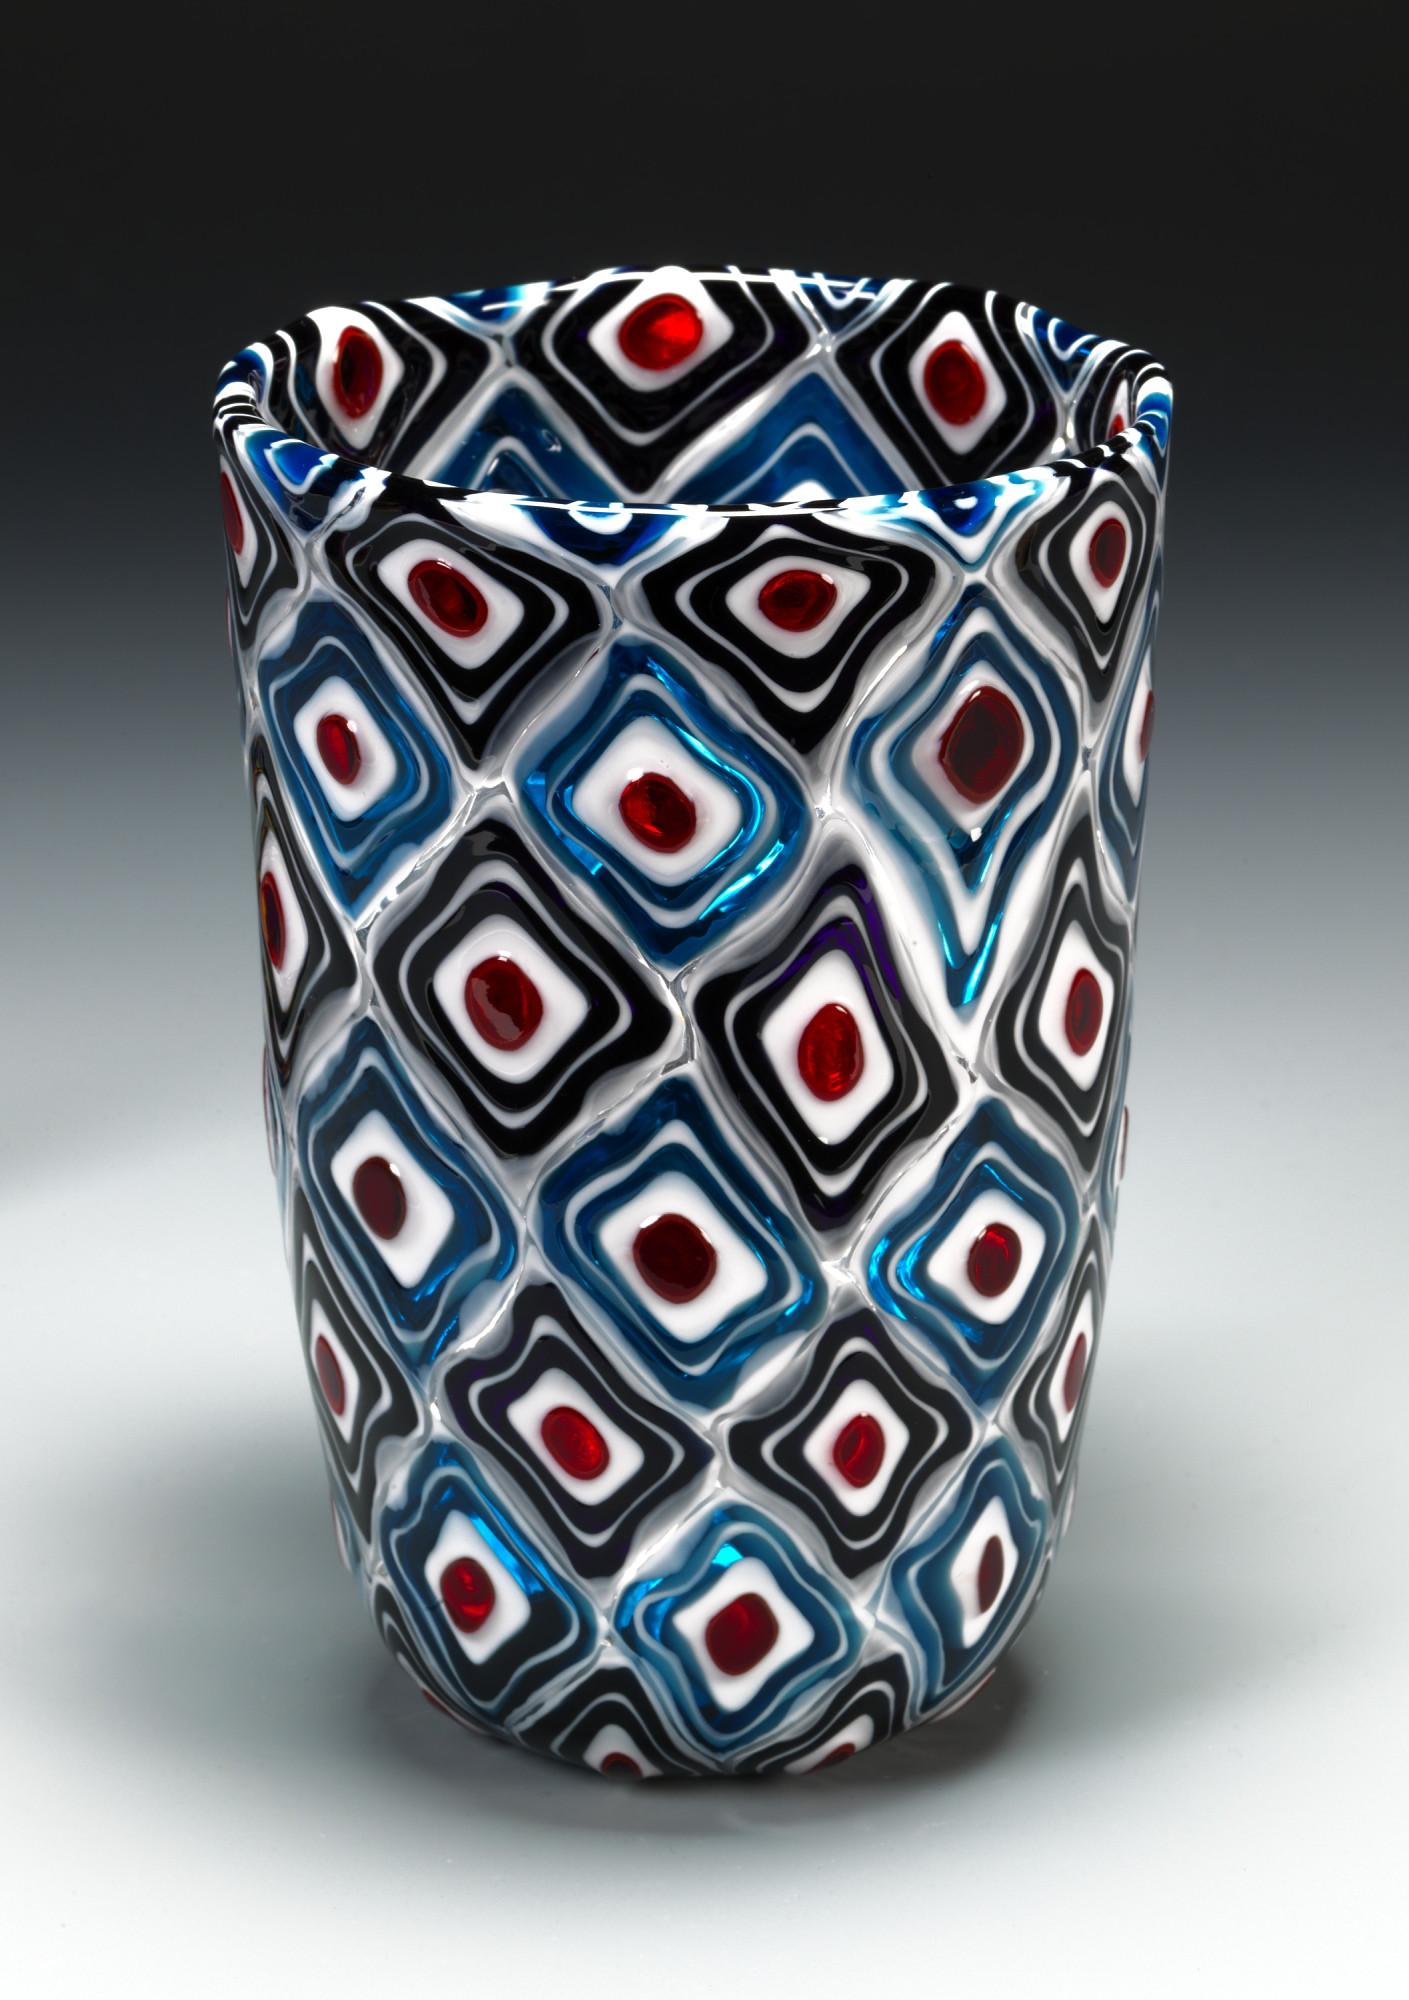 chihuly glass vase of untitled murrini vase smithsonian american art museum regarding zoom download